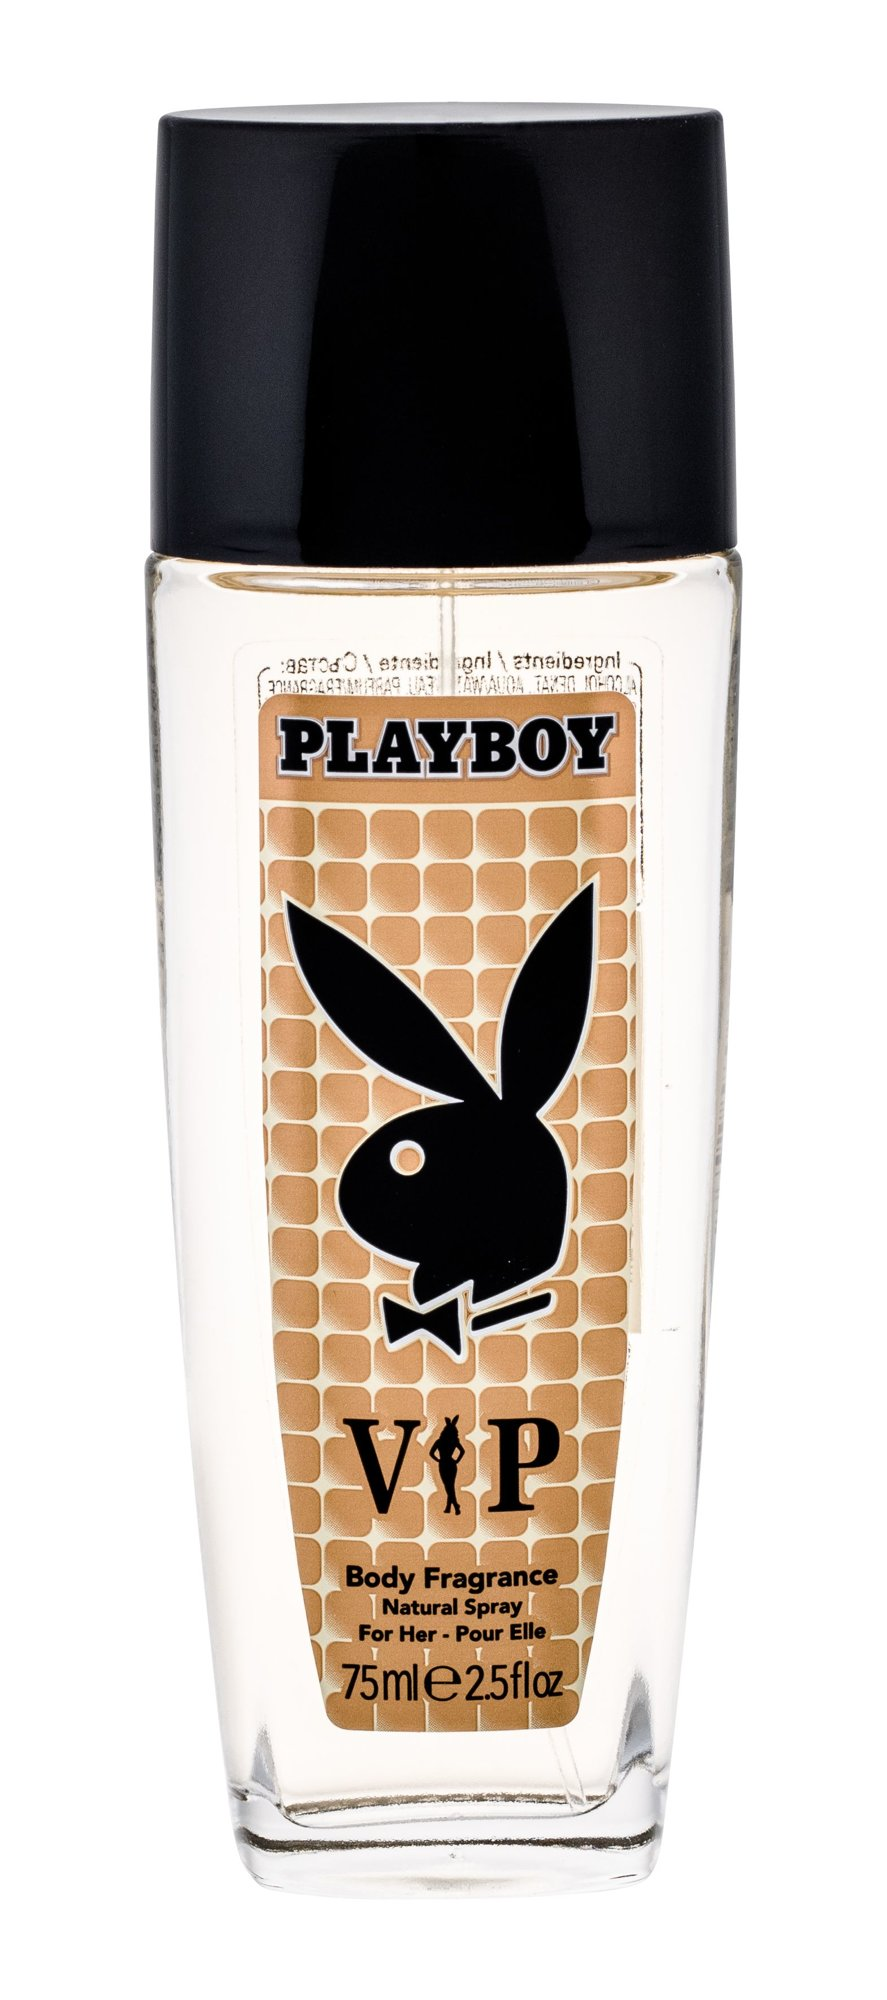 Playboy VIP For Her Deodorant 75ml